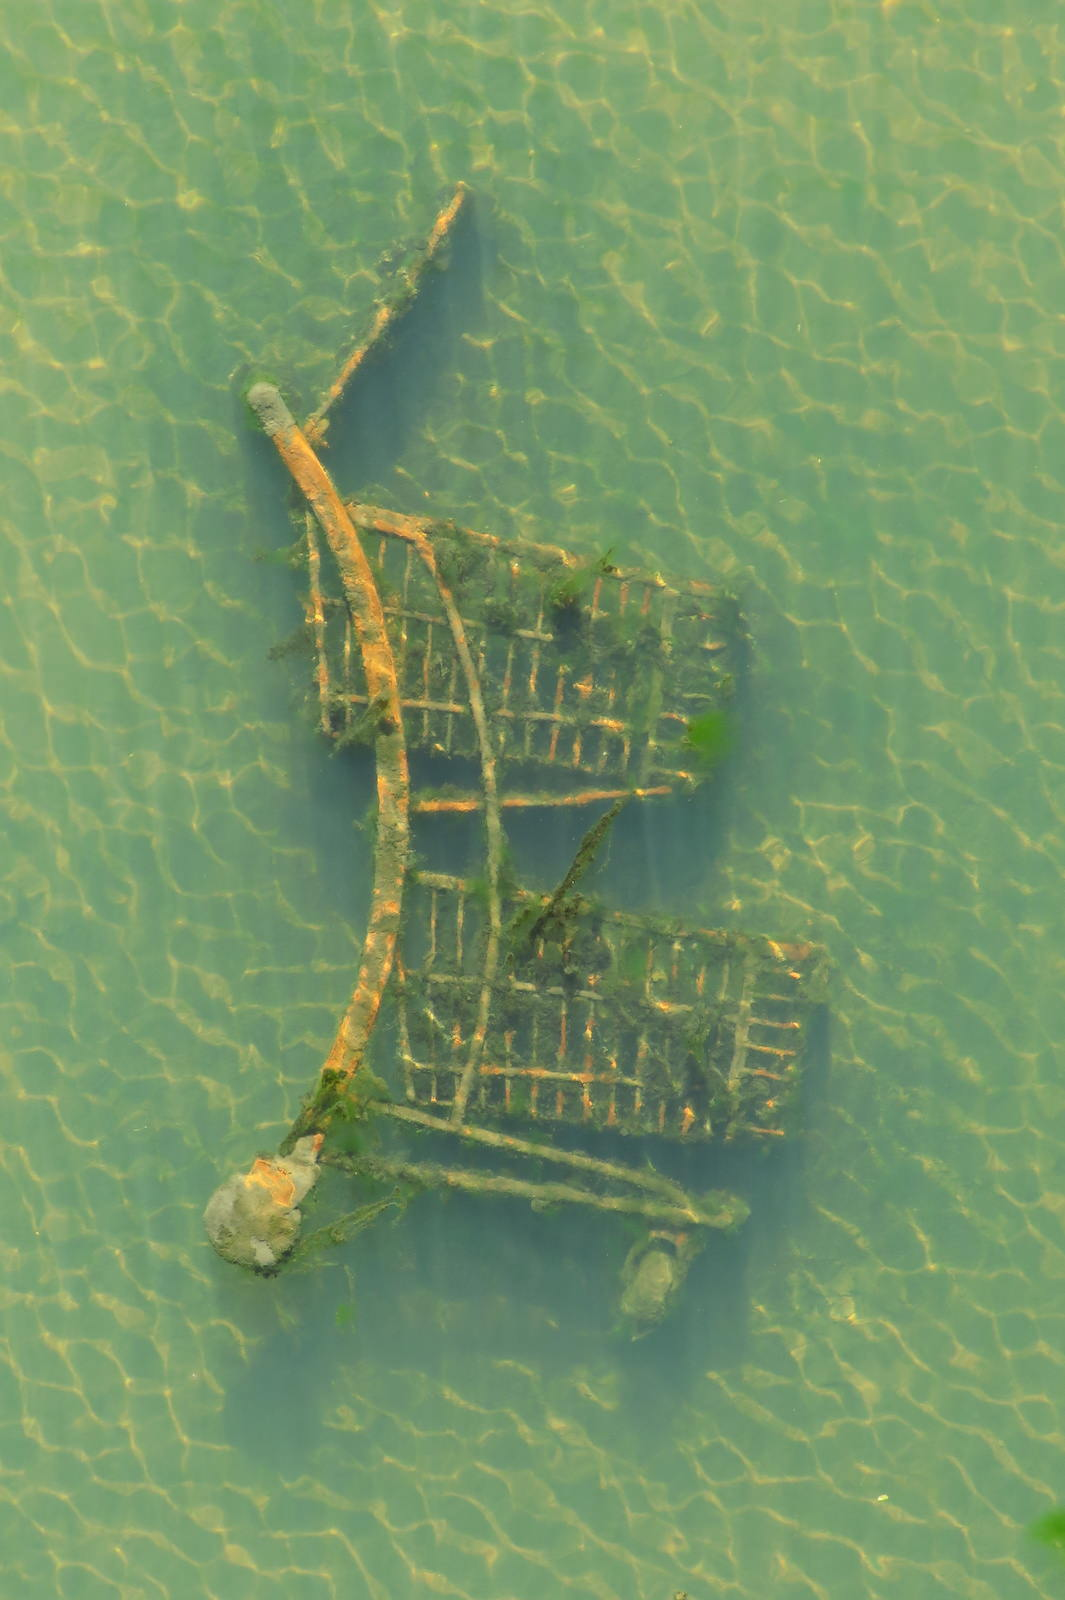 Rusty shopping cart under water